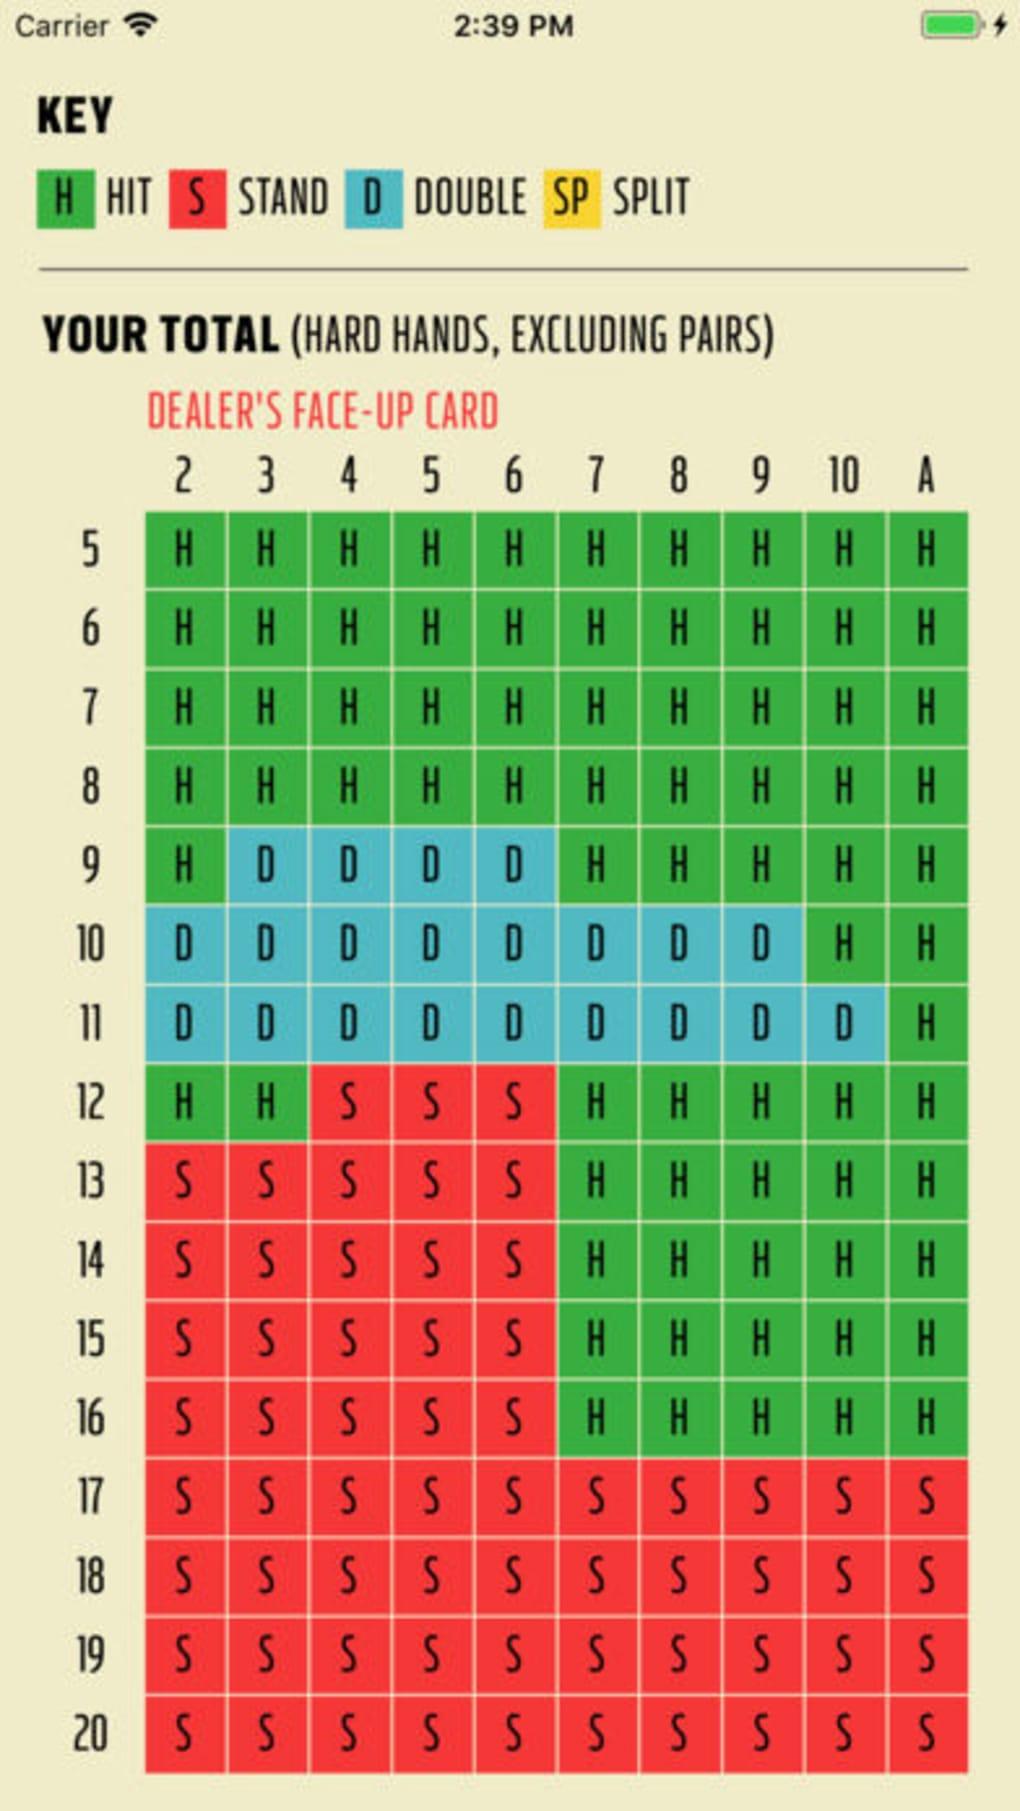 таблица блекджек на 8 колод